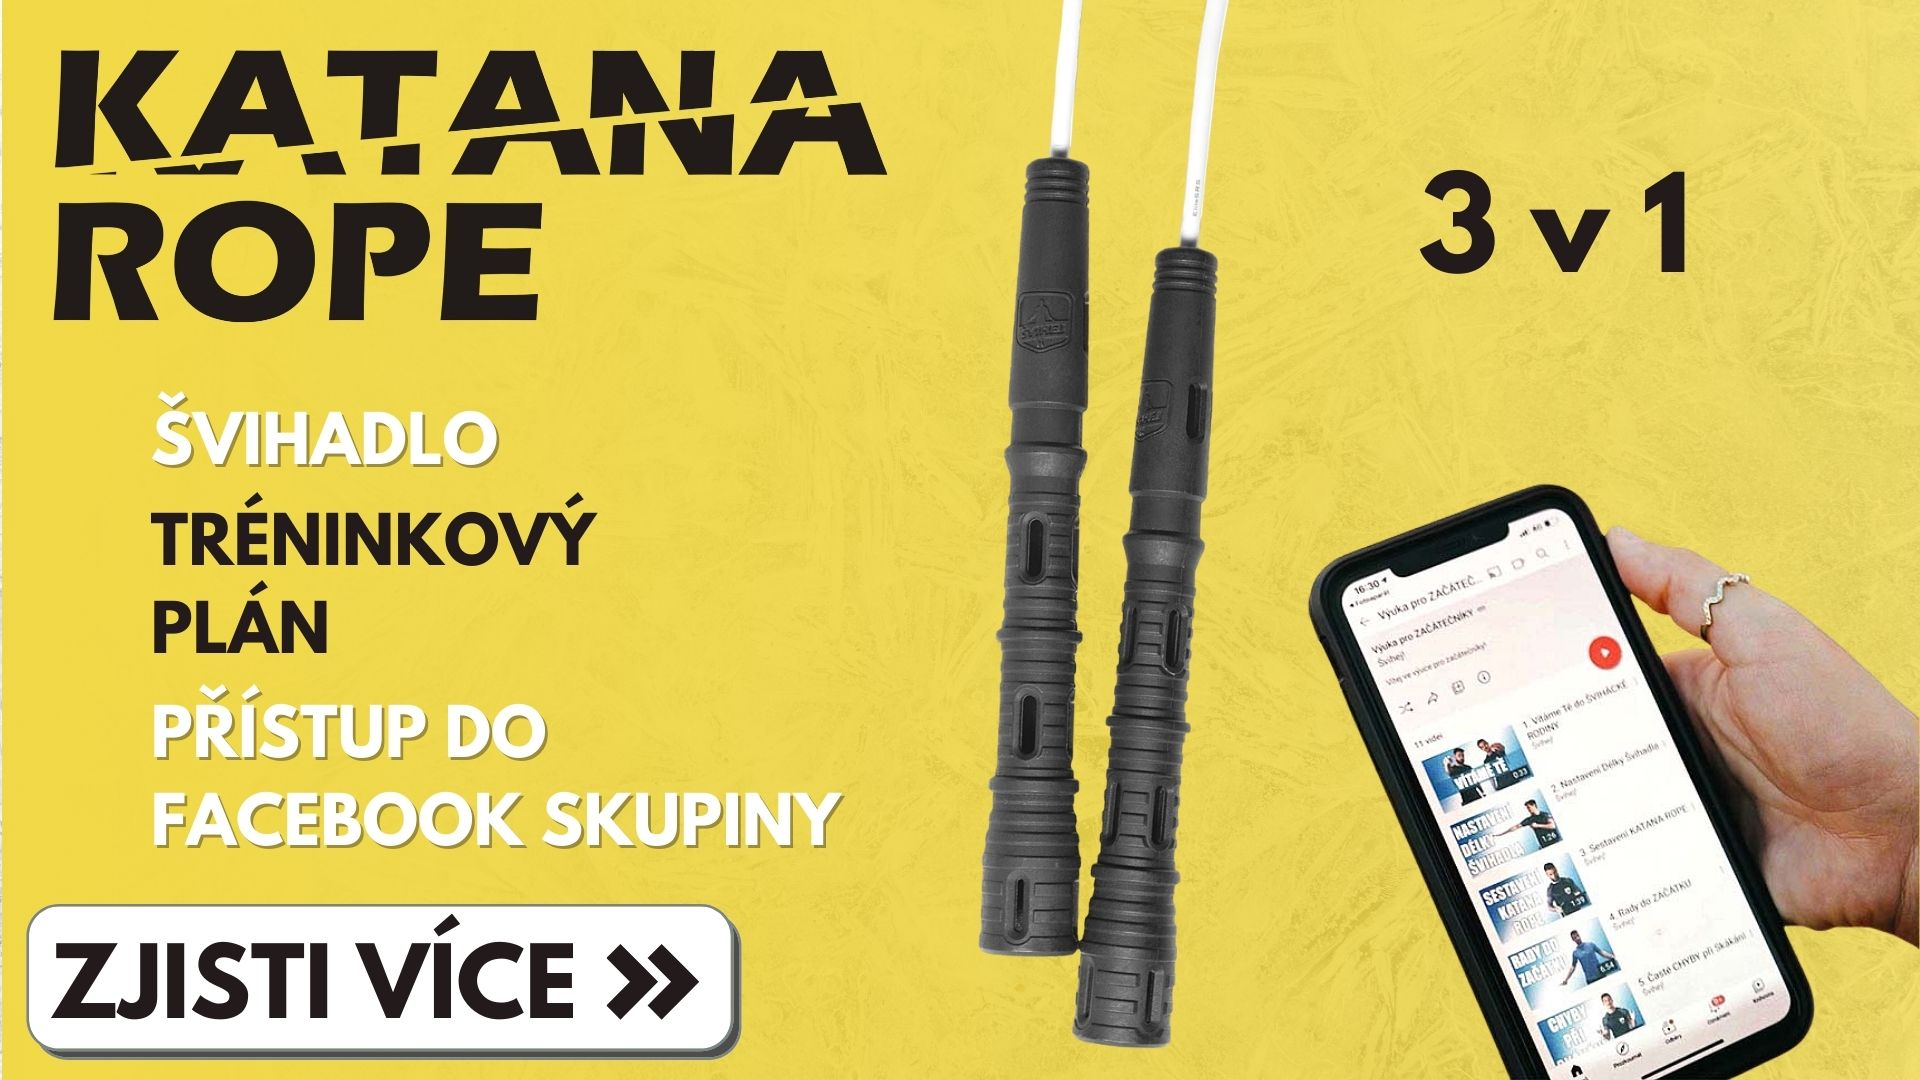 Katana rope